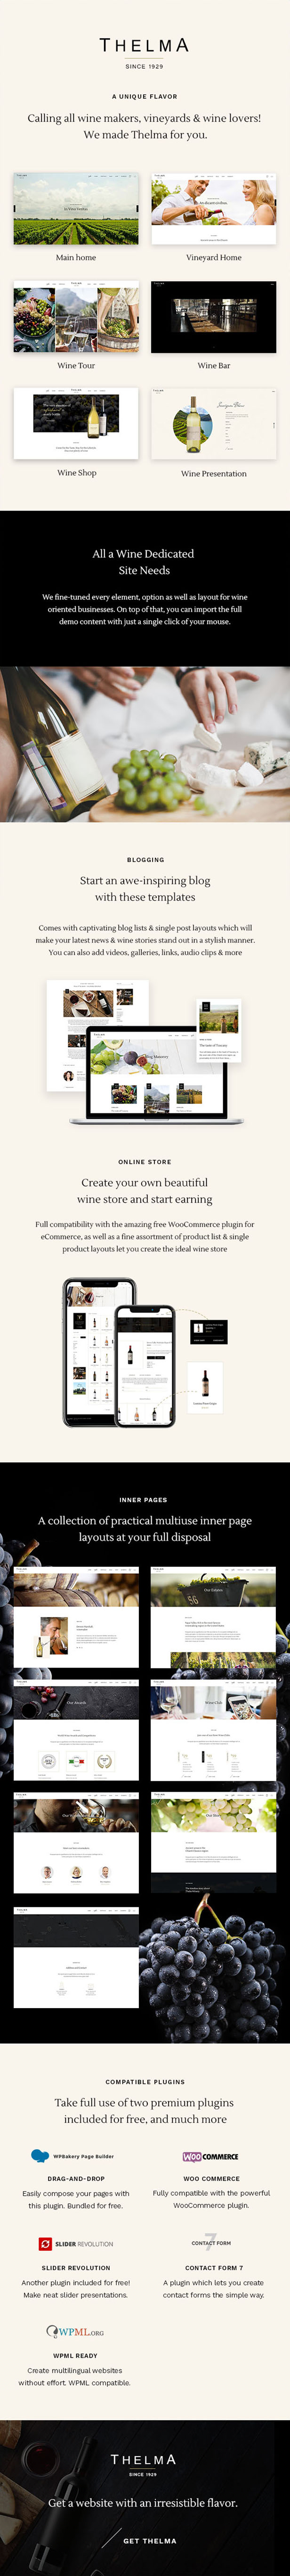 Thelma - Wine and Winery WordPress Theme - 1